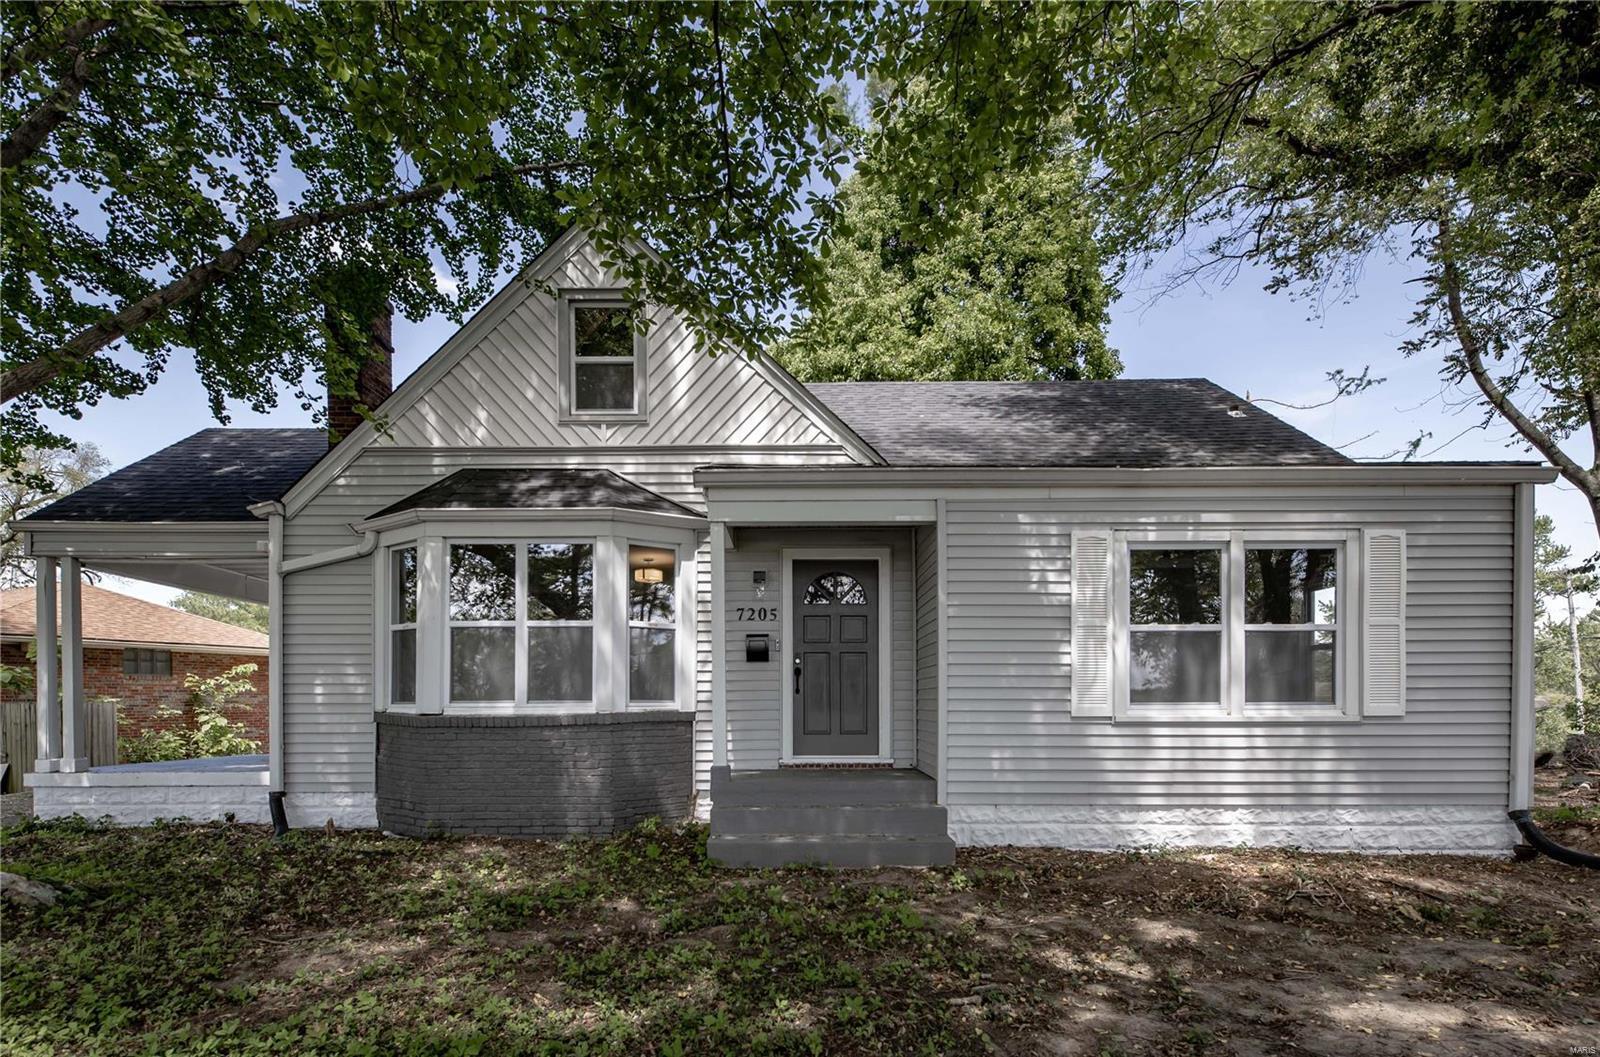 62205 Real Estate Listings Main Image